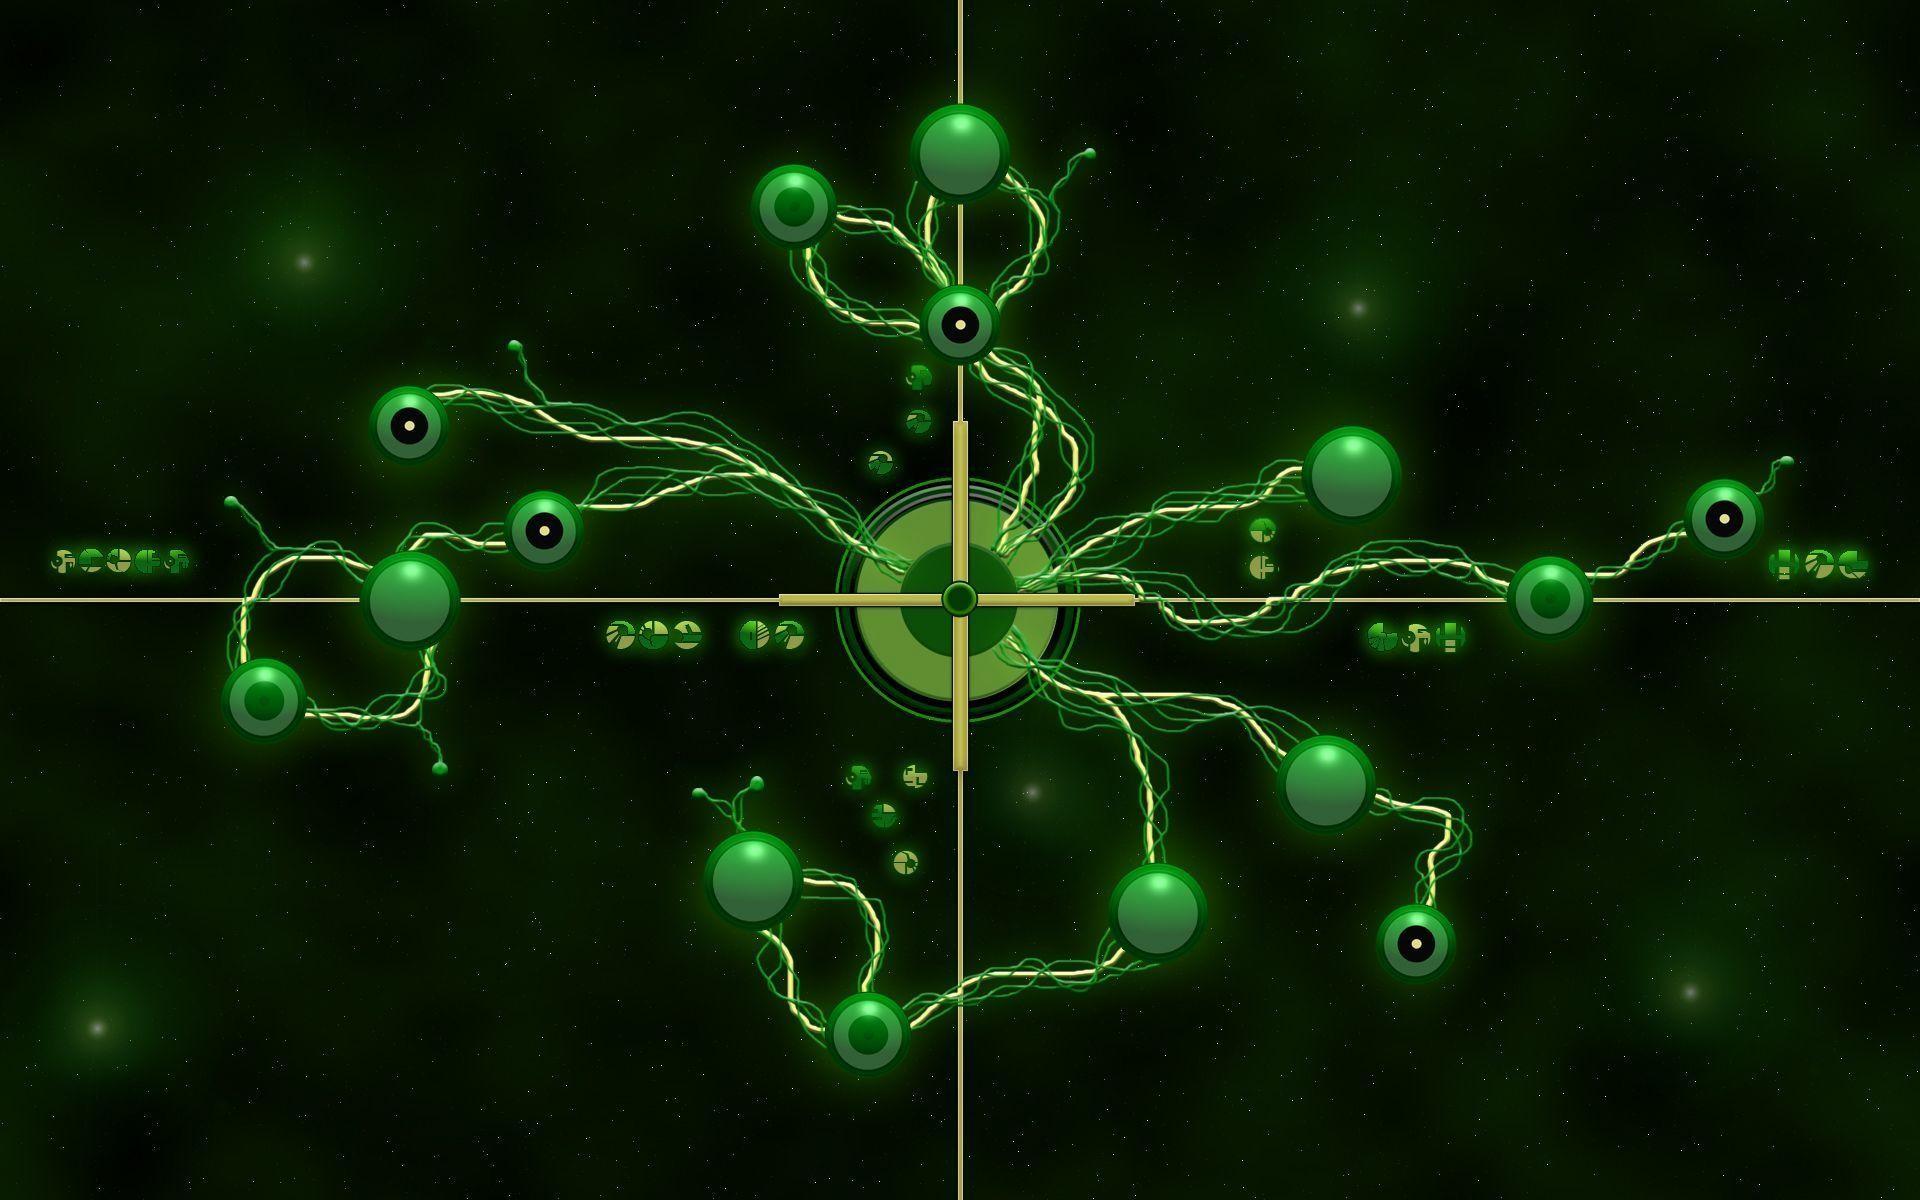 wallpaper.wiki-Borg-Star-Trek-Widescreen-Wallpaper-PIC-